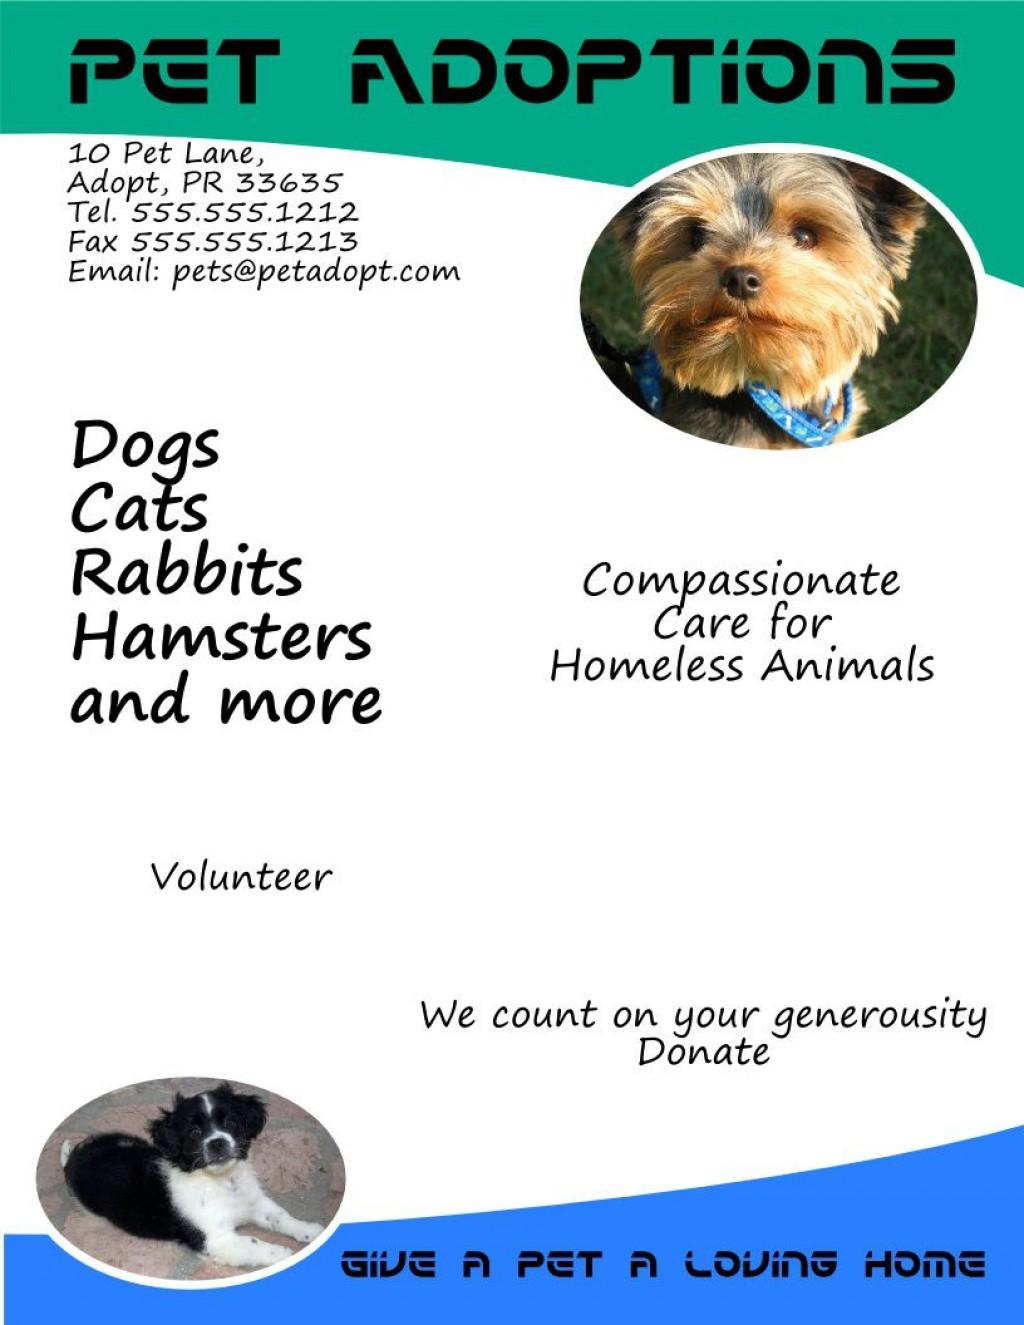 005 Amazing Pet Adoption Flyer Template High Resolution  Free Event DogLarge